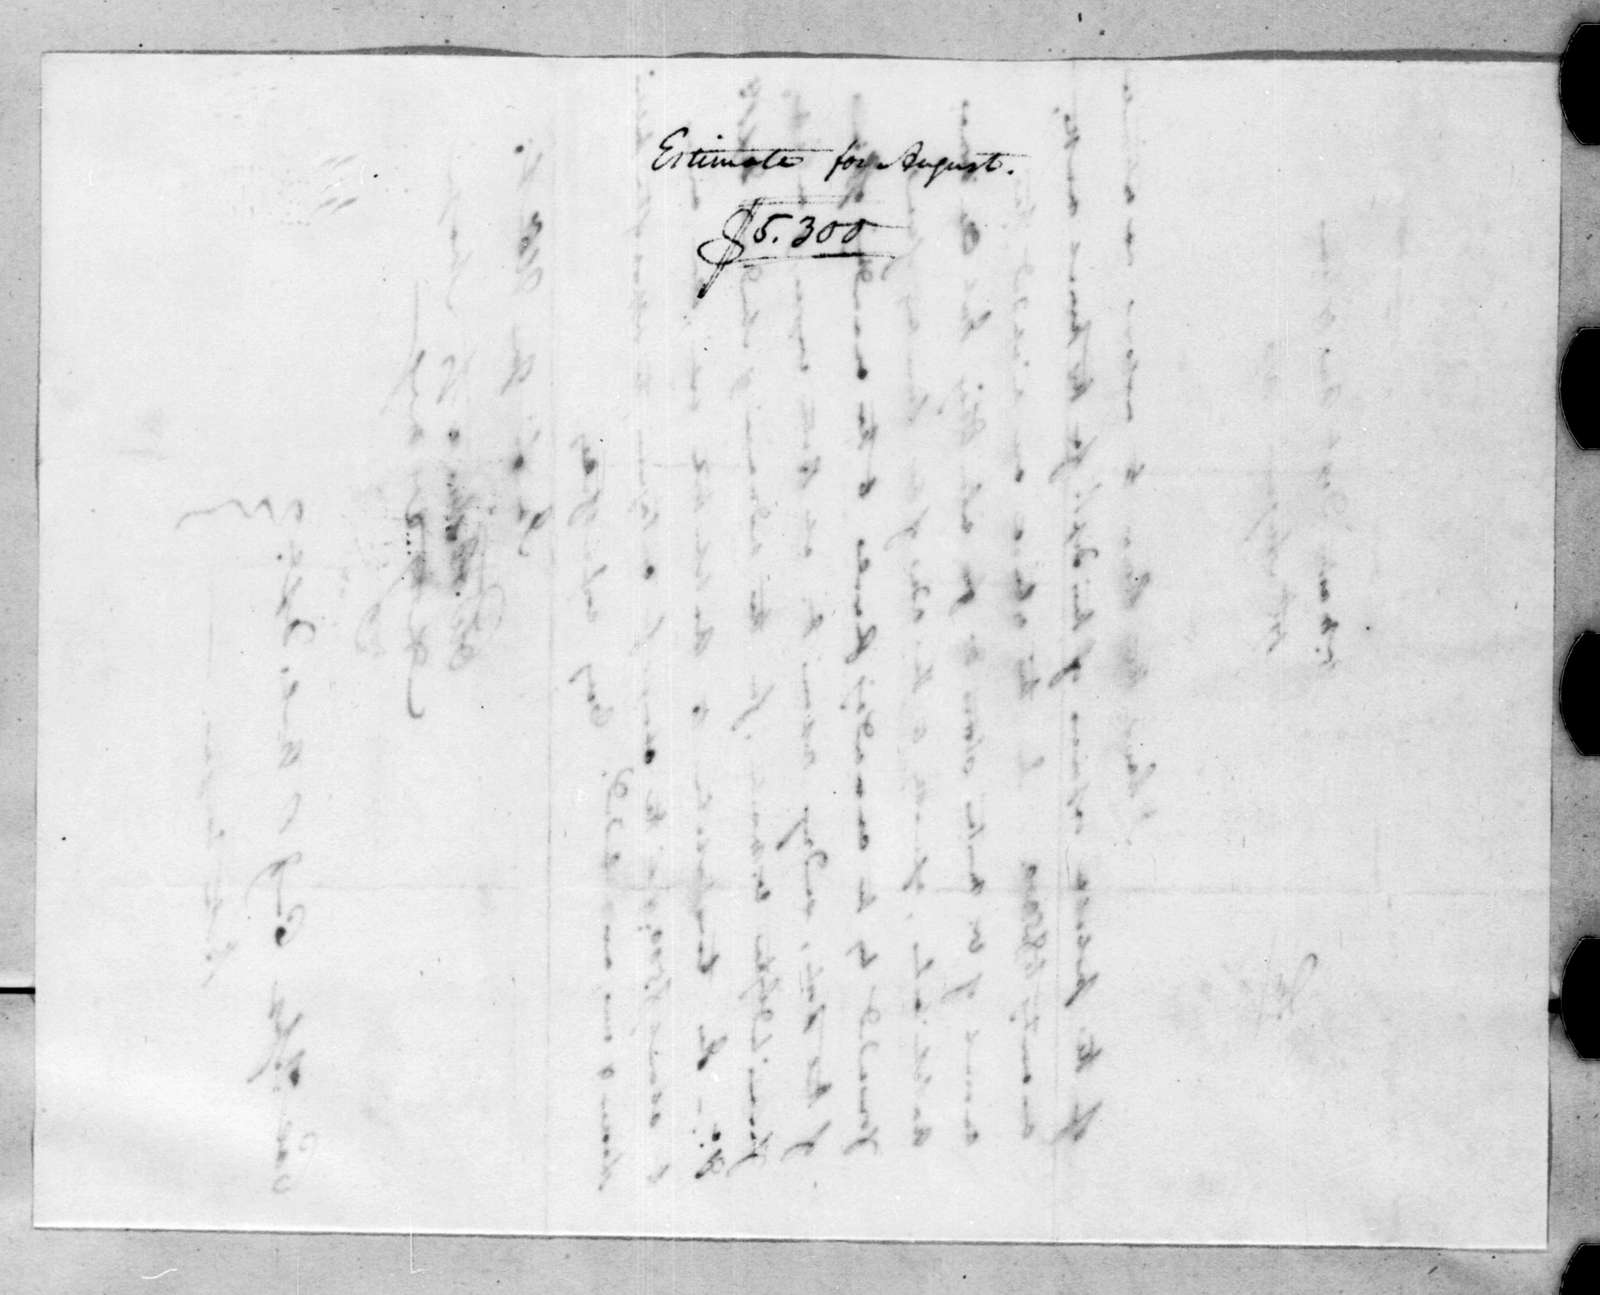 Charles Wollstonecraft to Thomas Sidney Jesup, August 17, 1816